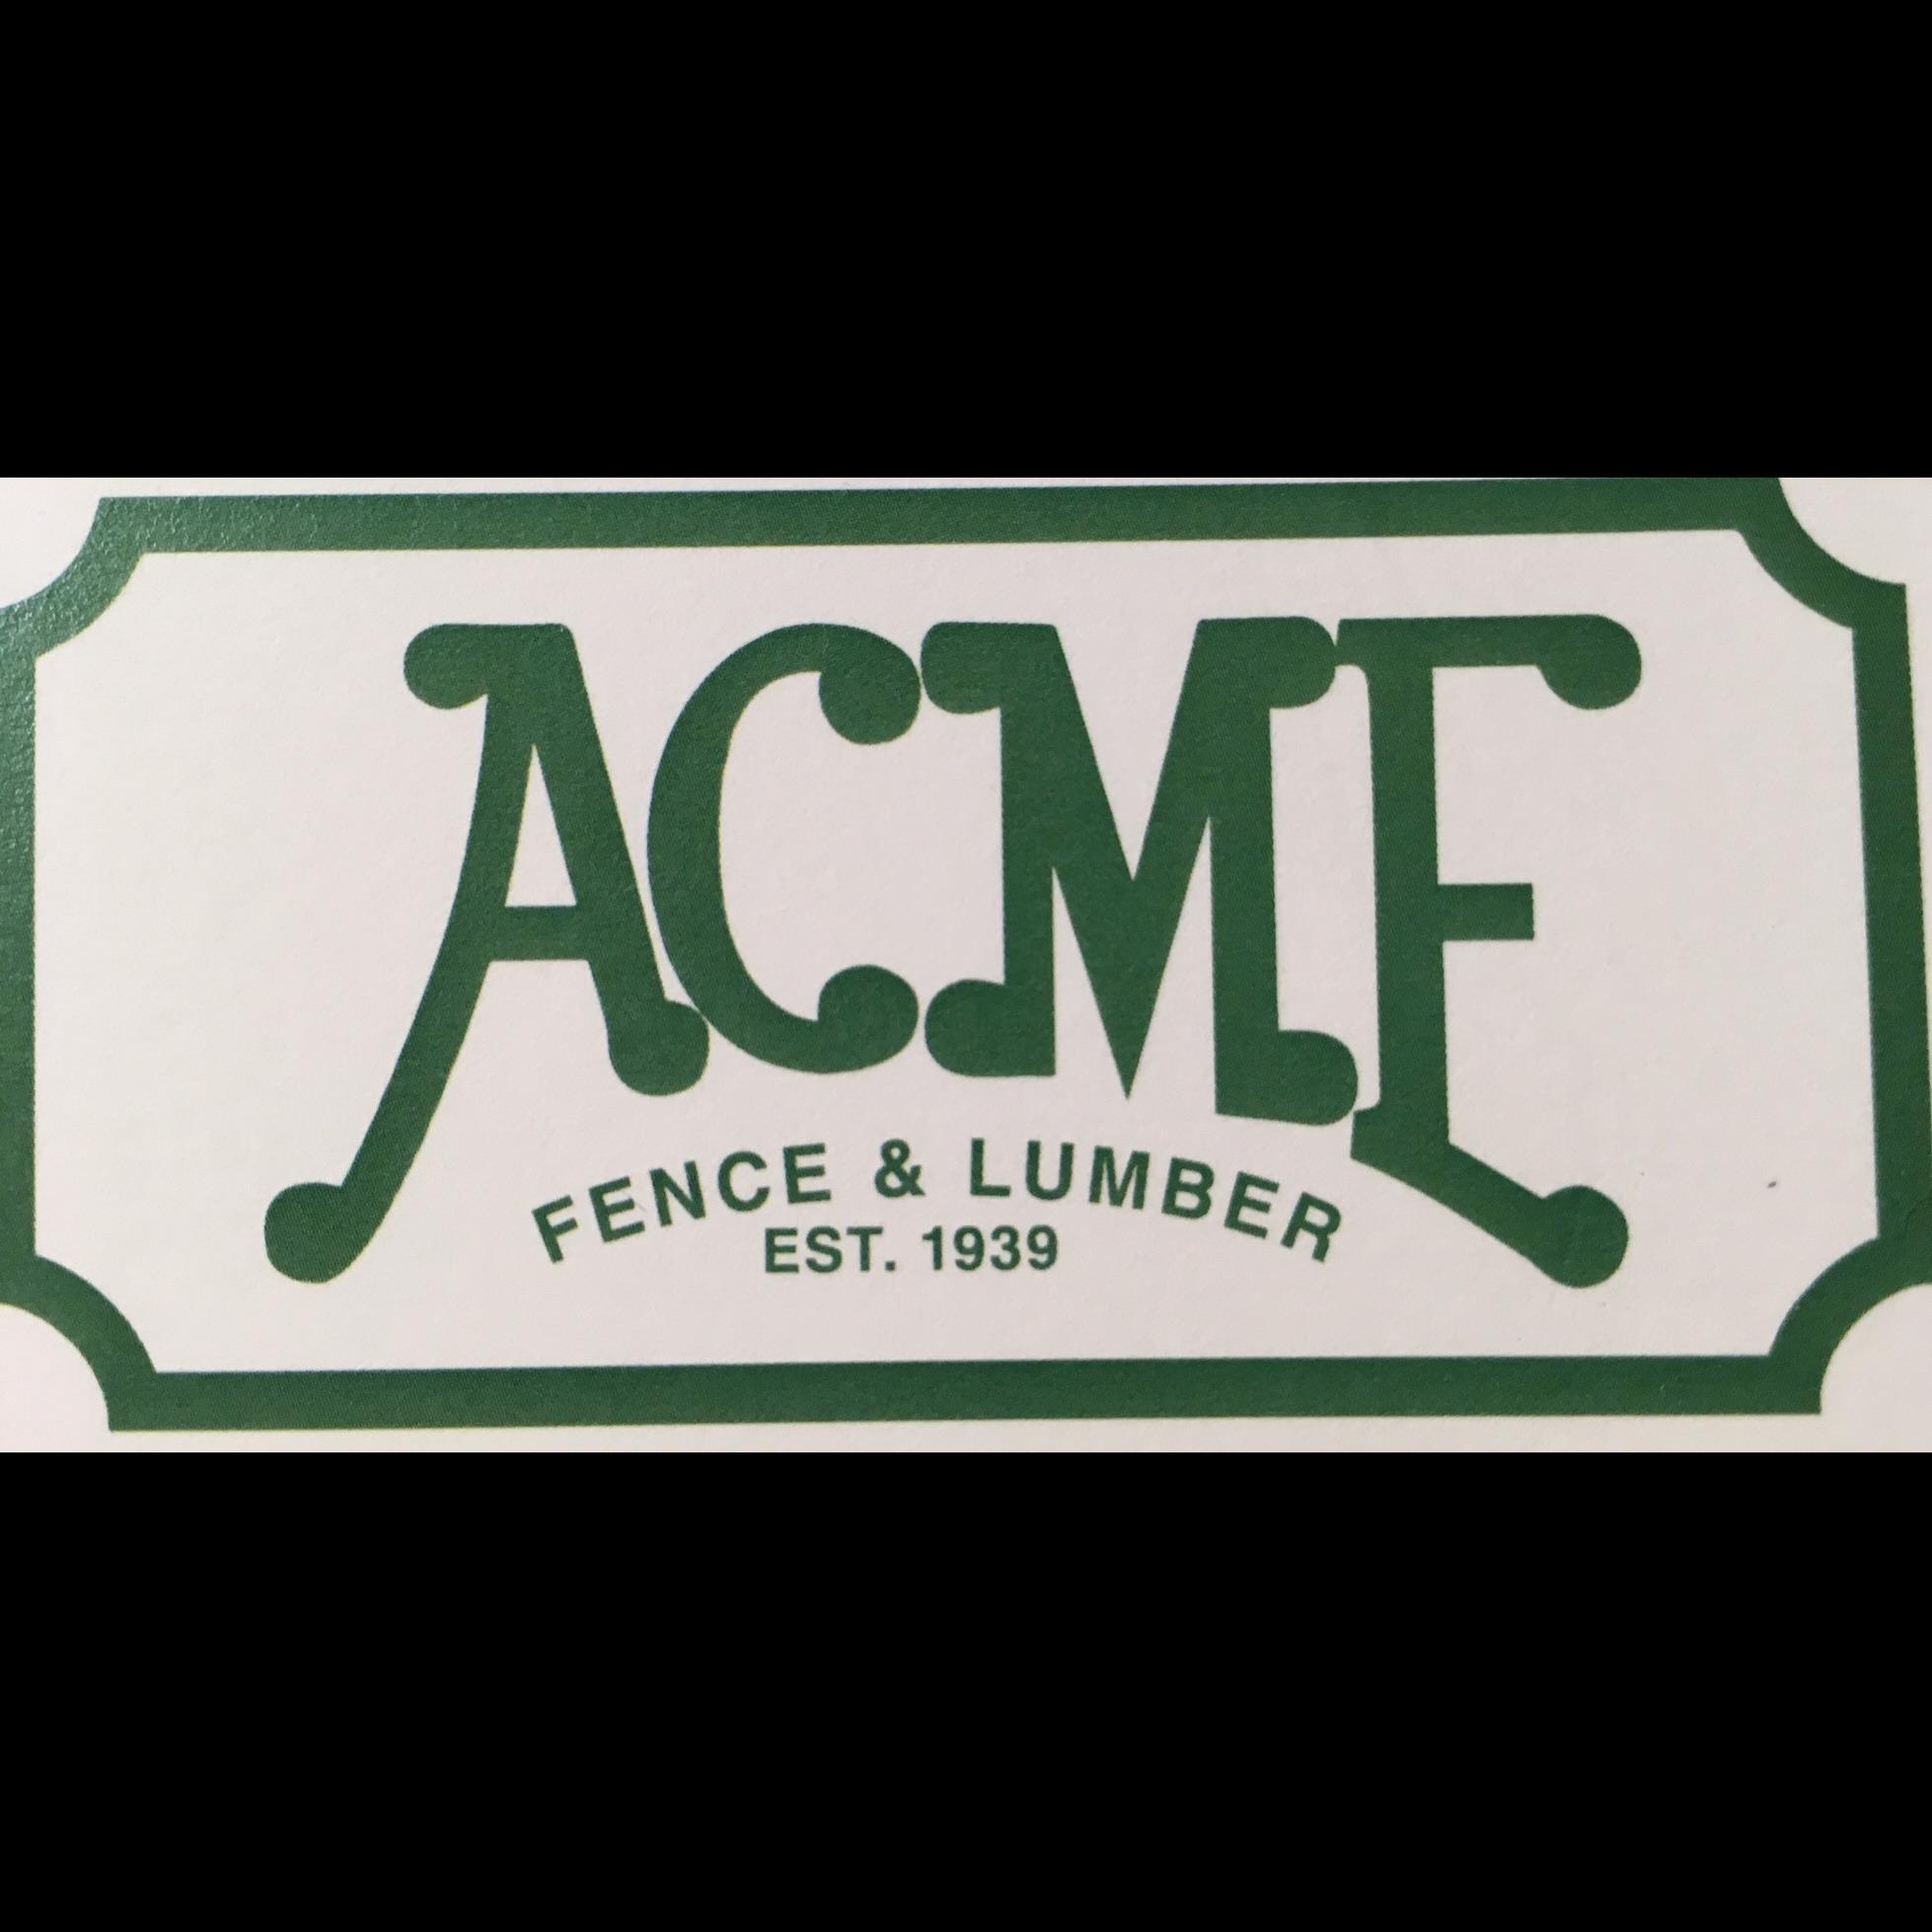 Acme Fence